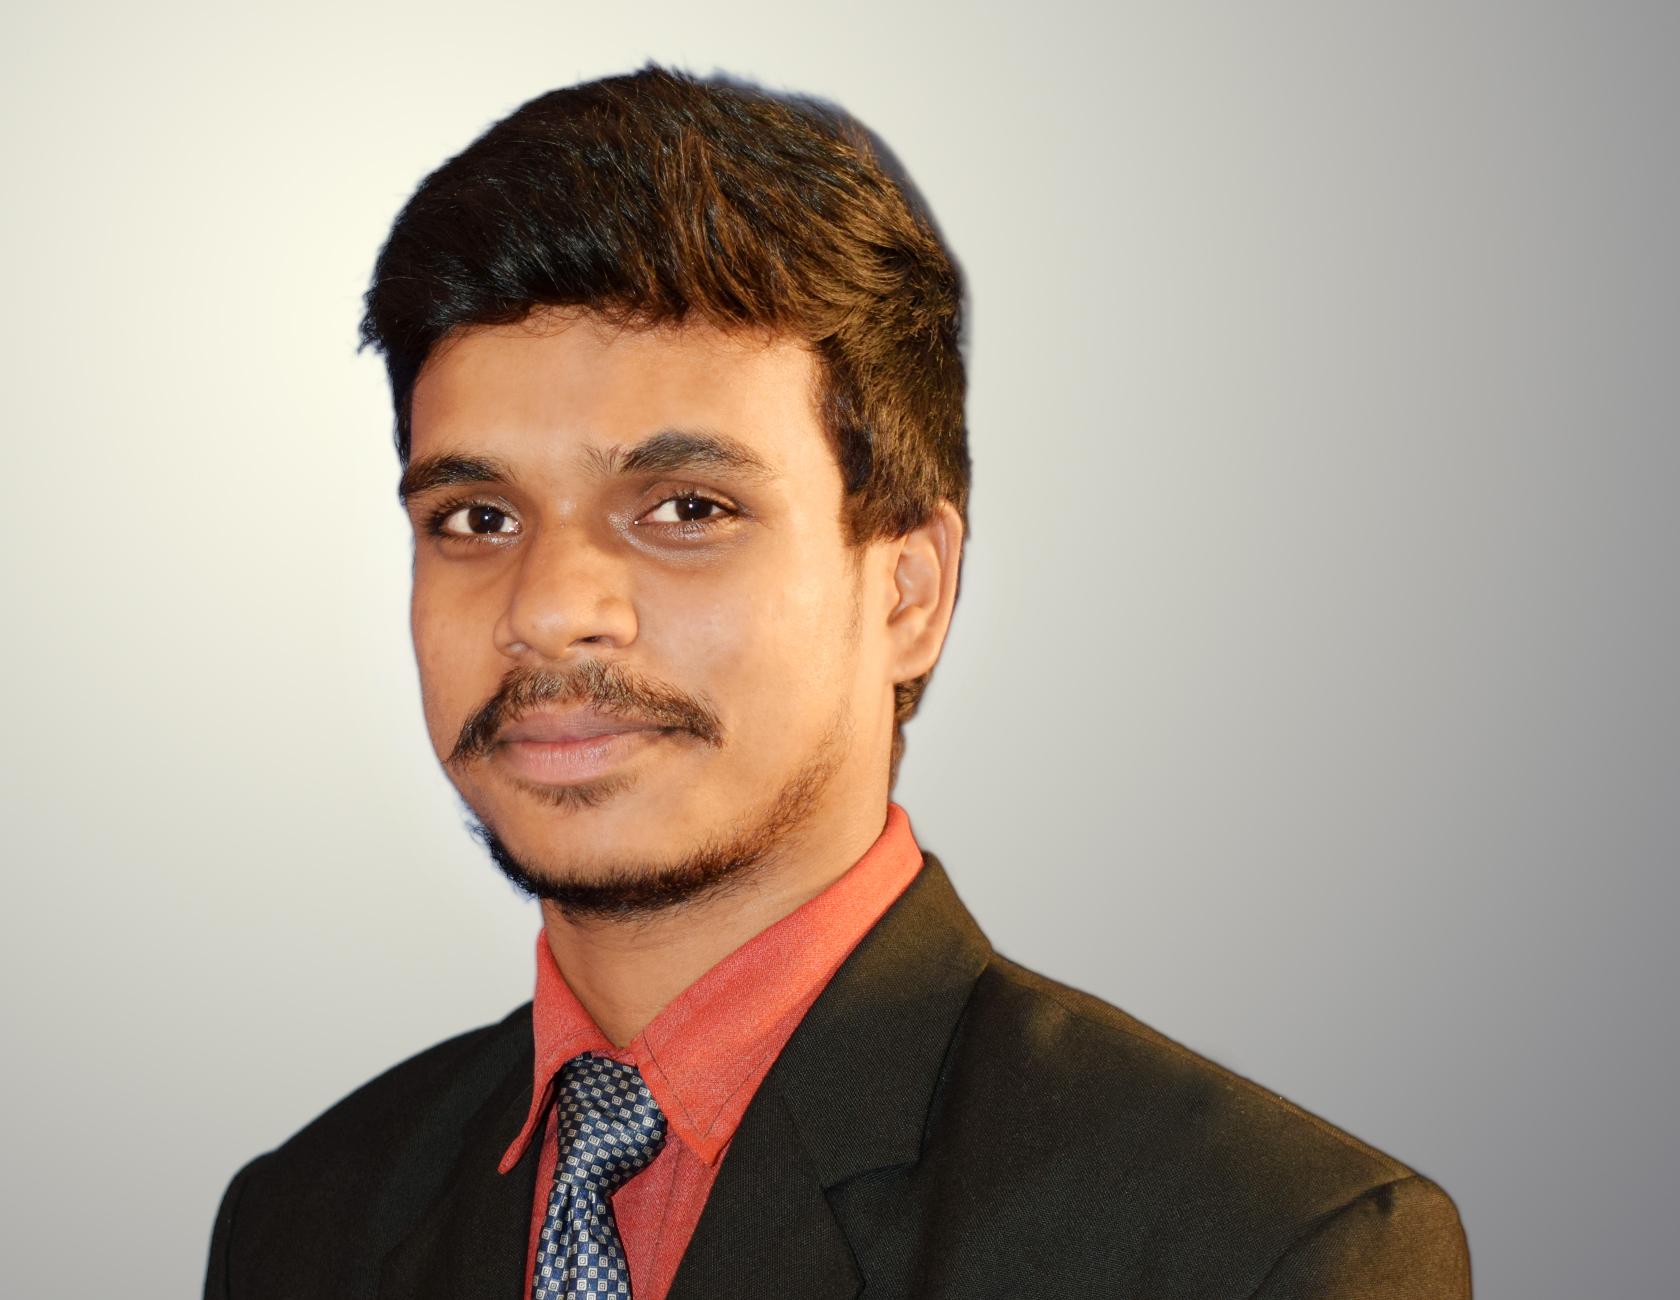 Saikrishna-Daadi